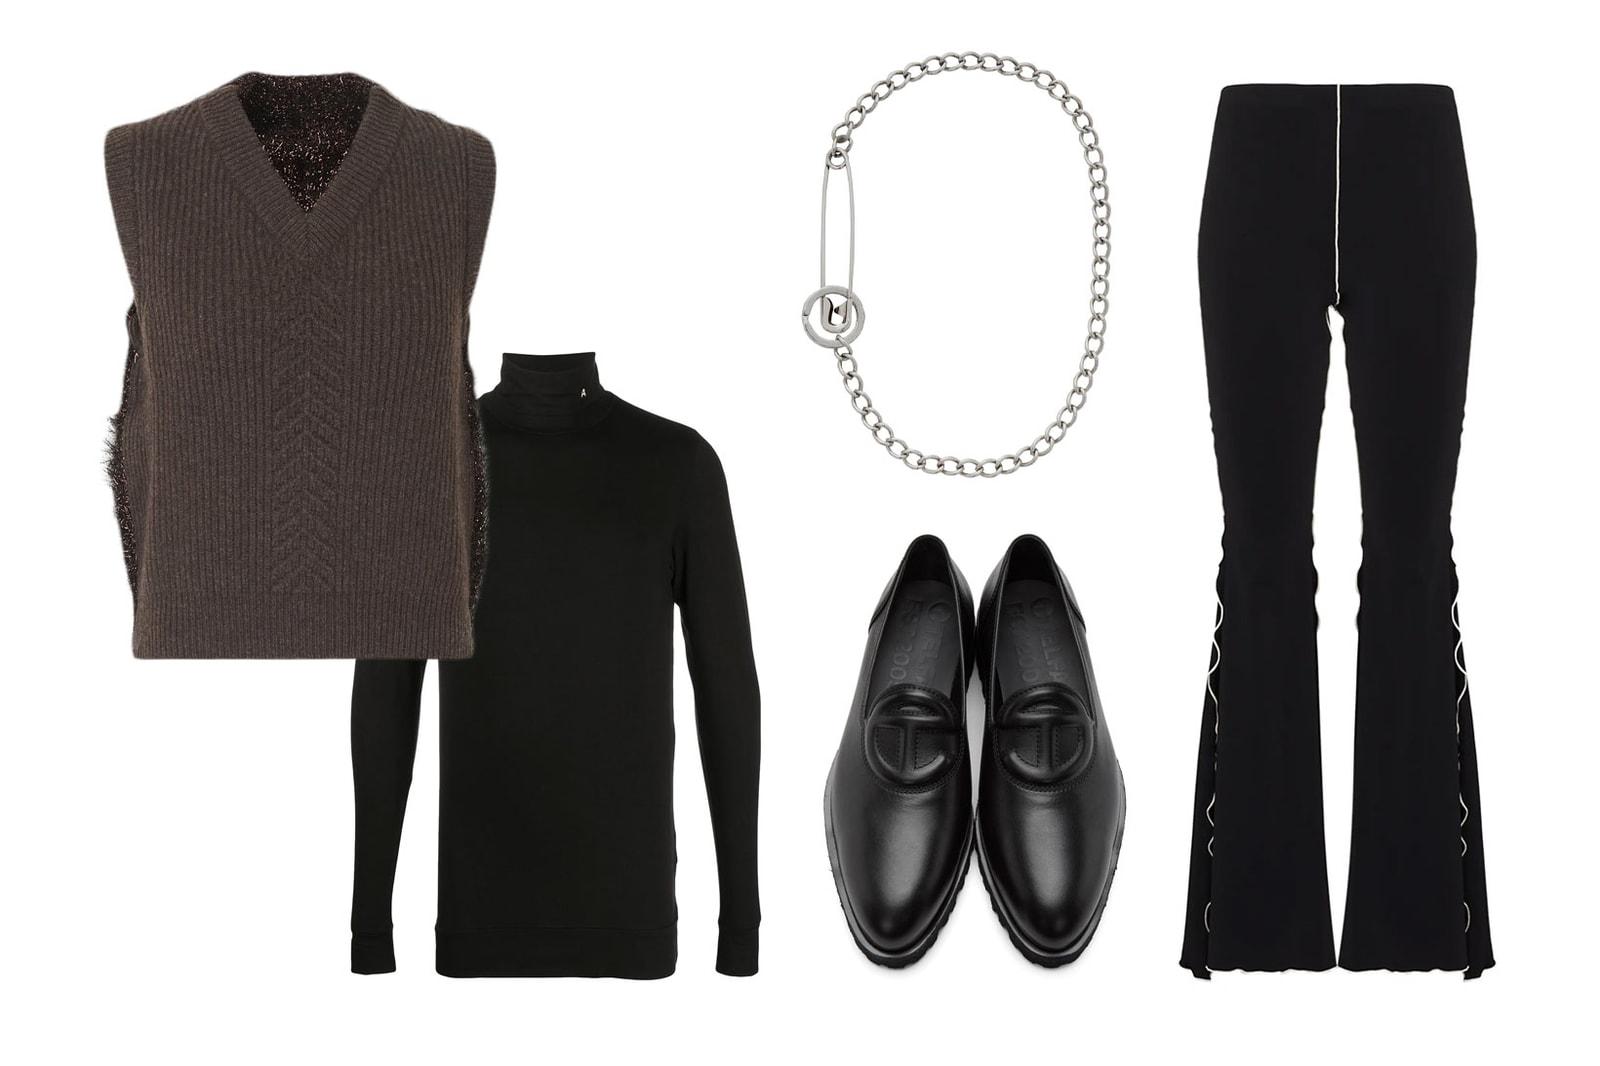 sweater knit vest styling outfit ideas maison margiela fantabody flared leggings ambush turtleneck telfar loafers